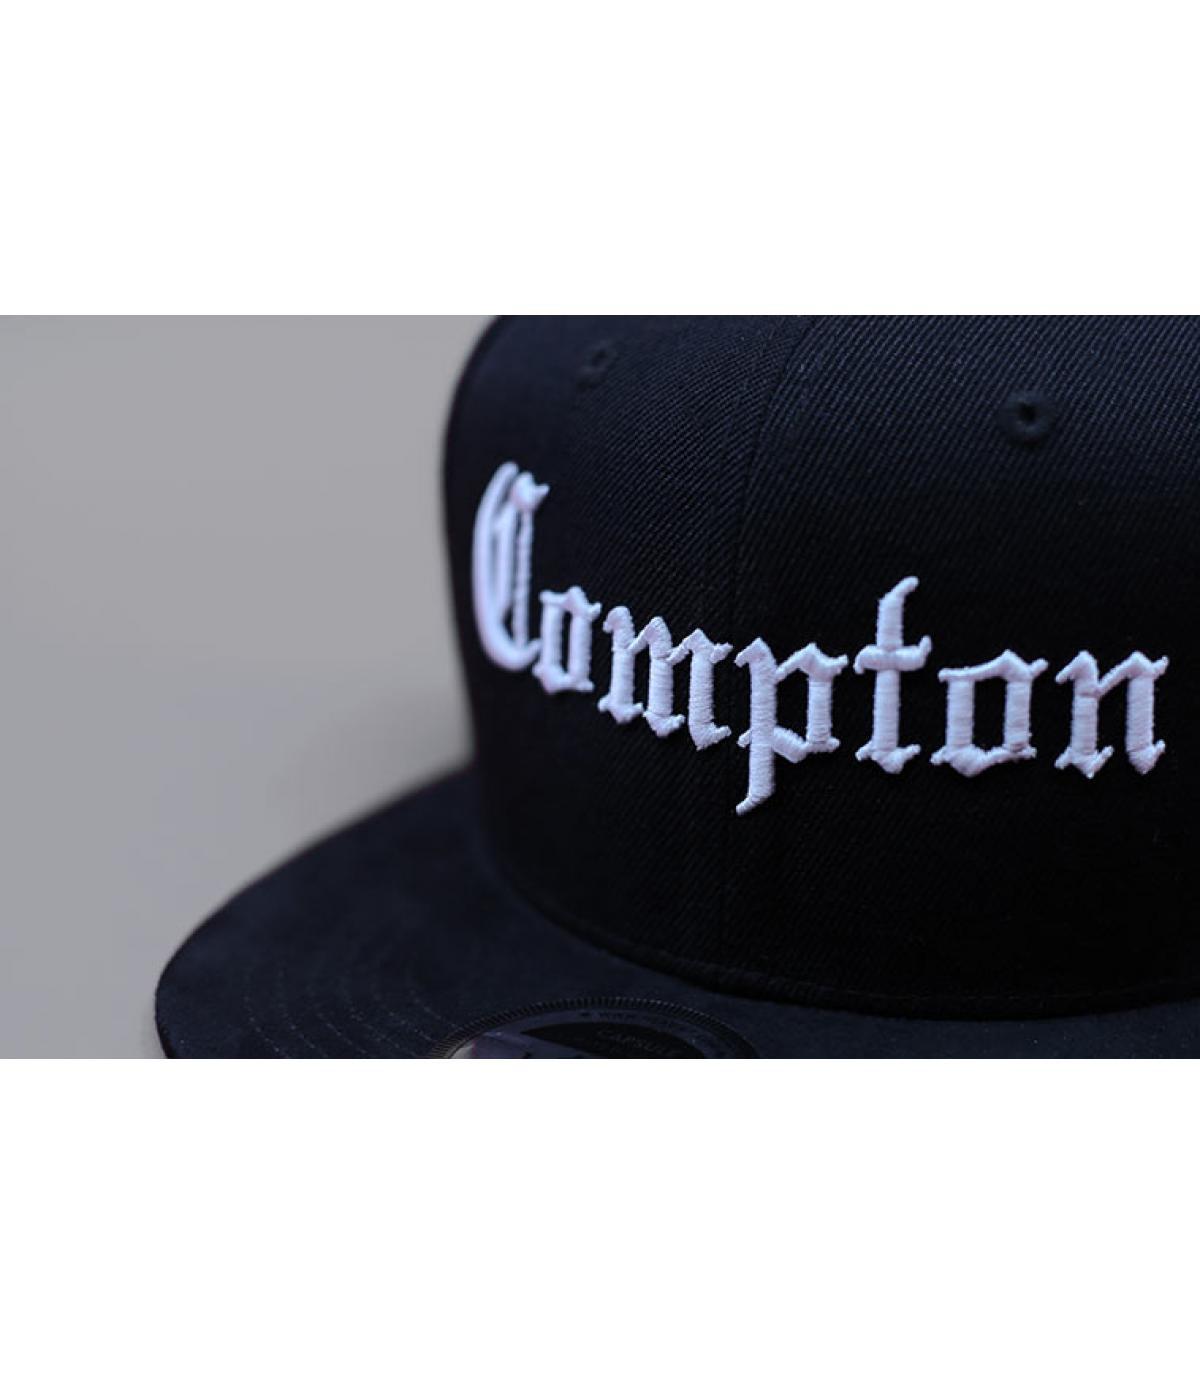 Details Compton Snapback - afbeeling 4